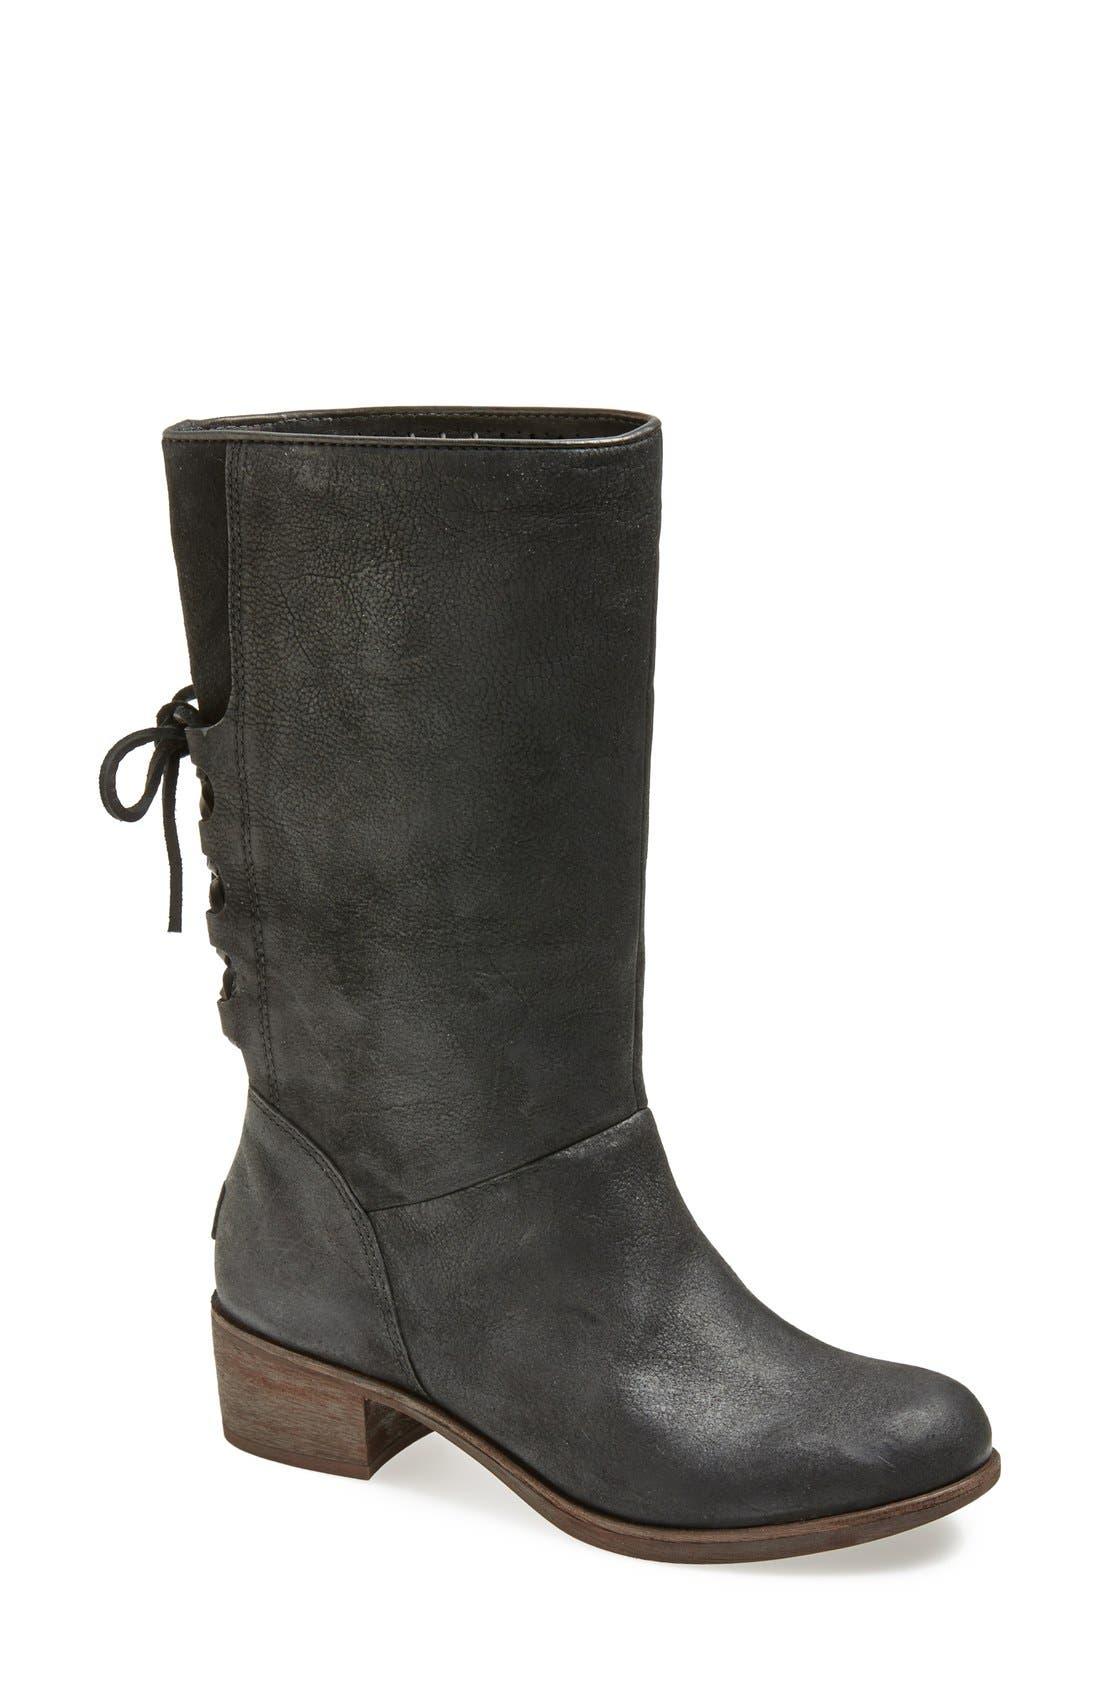 Alternate Image 1 Selected - UGG® Australia 'Cary' Boot (Women)